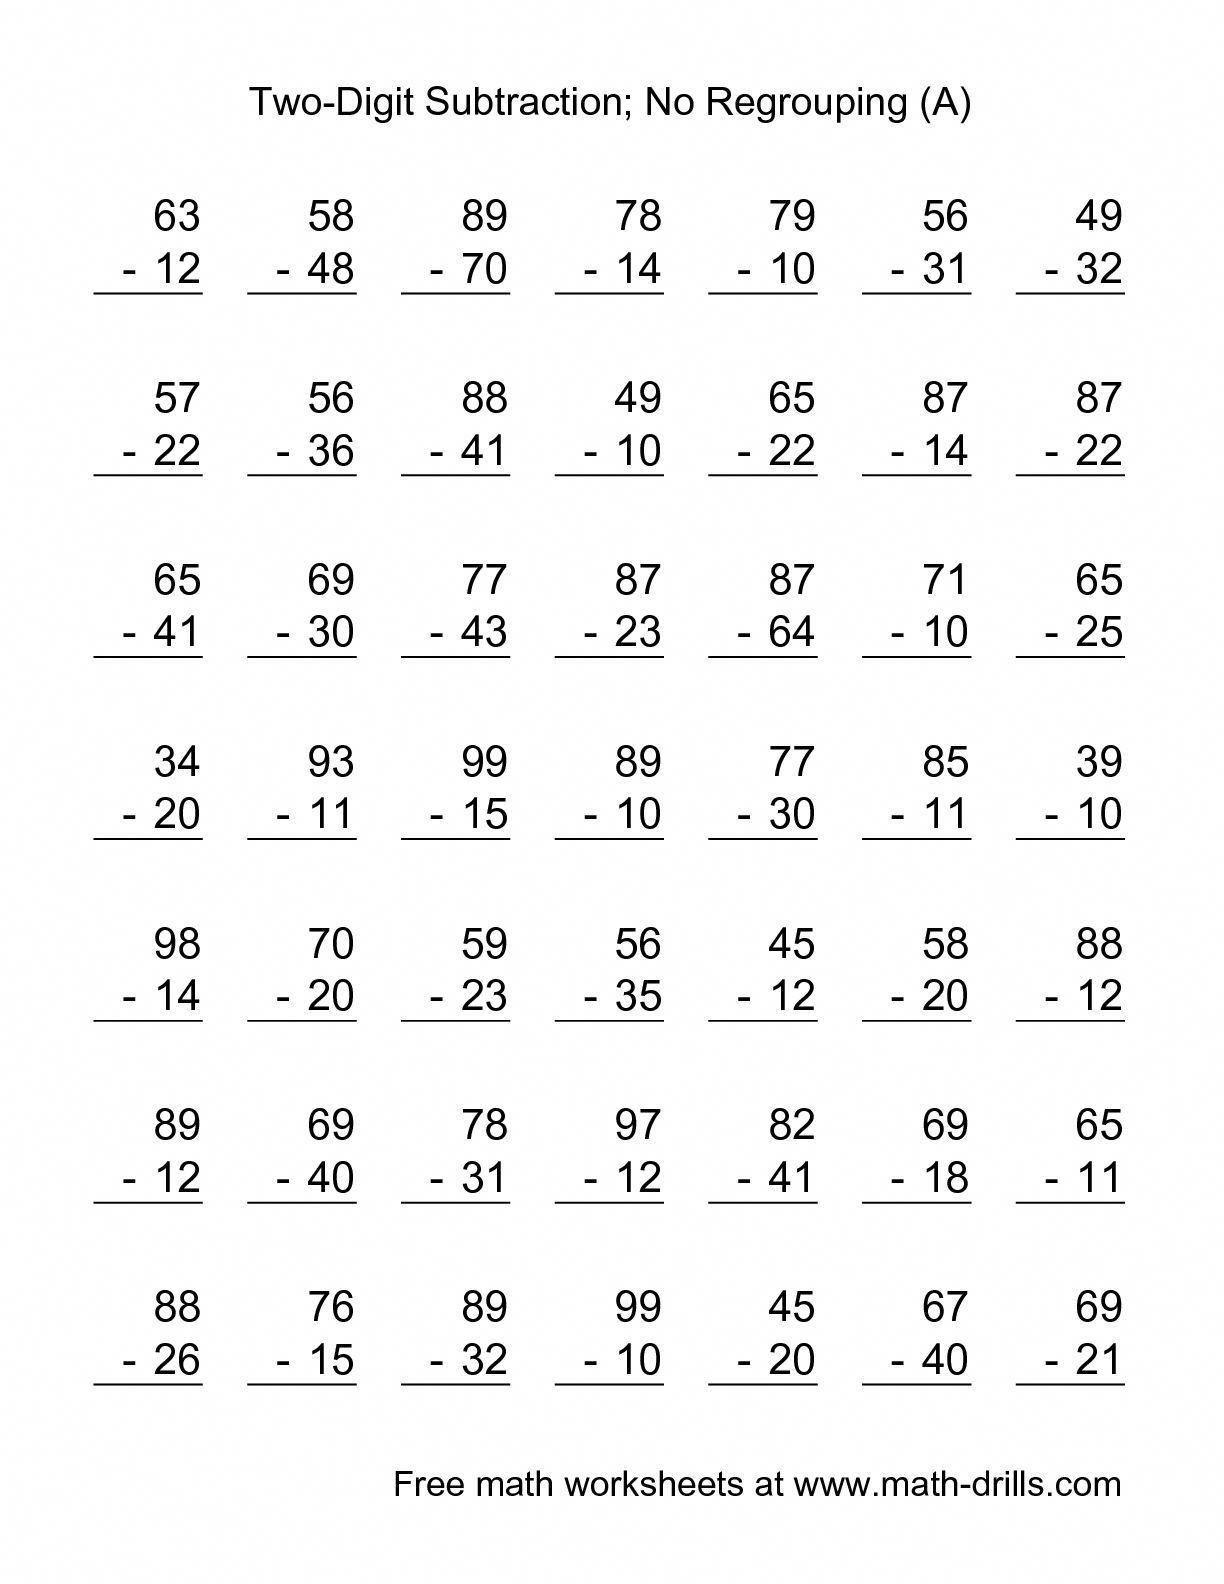 3 Worksheet Free Math Worksheets First Grade 1 Addition Add Two 2 Digit Numb 2nd Grade Math Worksheets Easy Math Worksheets Addition And Subtraction Worksheets